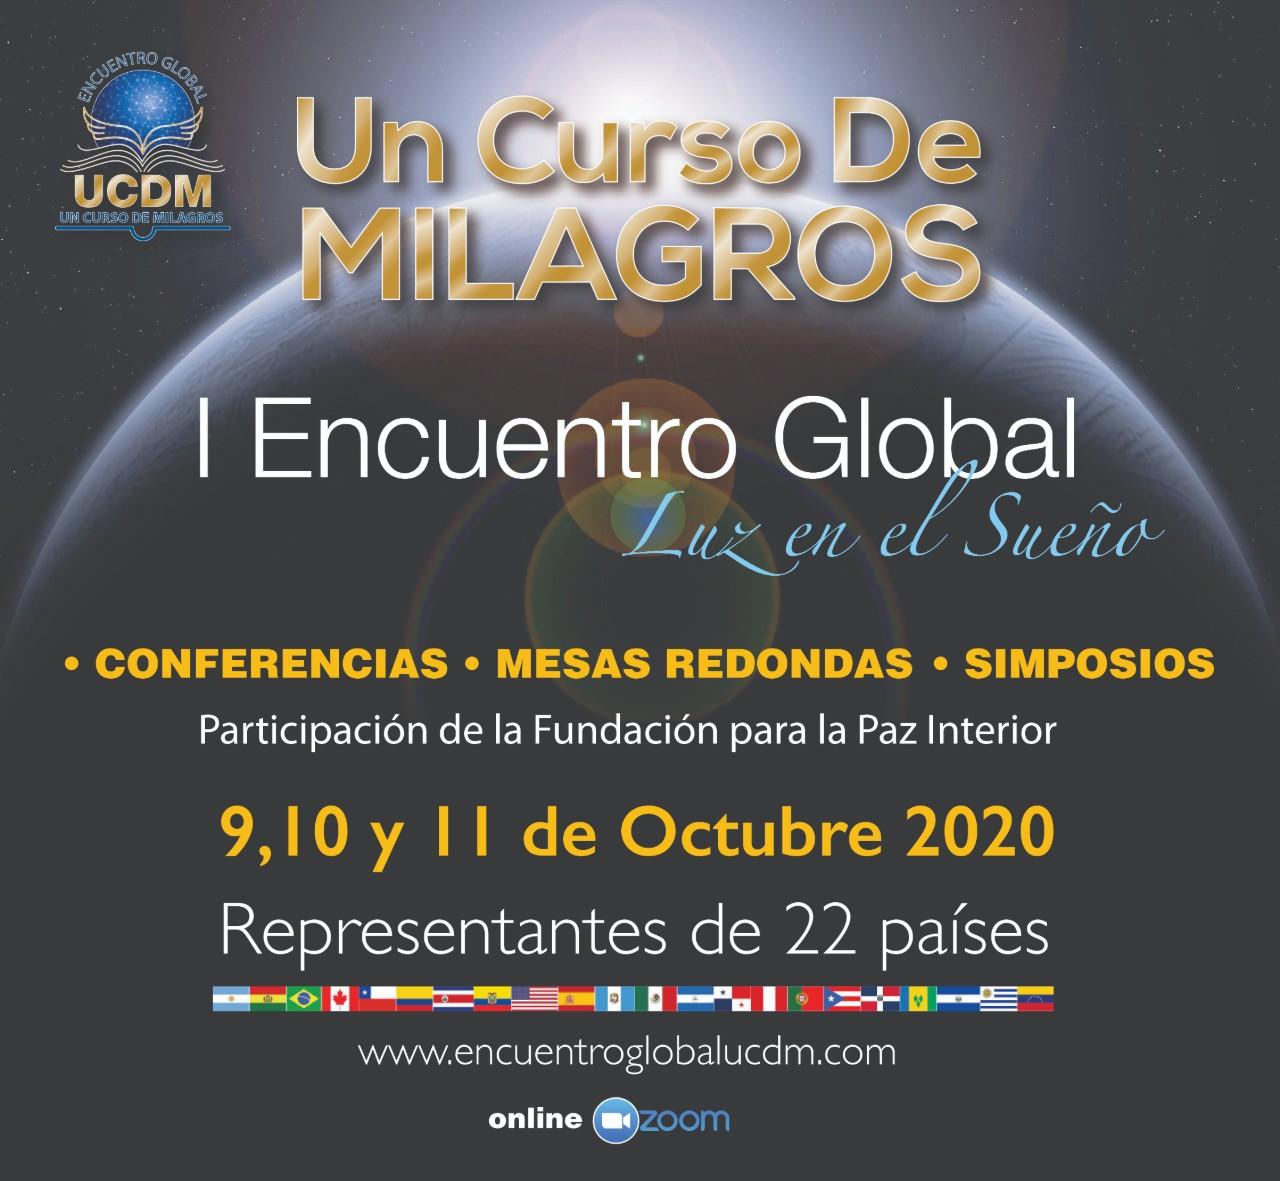 HD-flayers-definitivo-Iencuentro-UNCDM-01